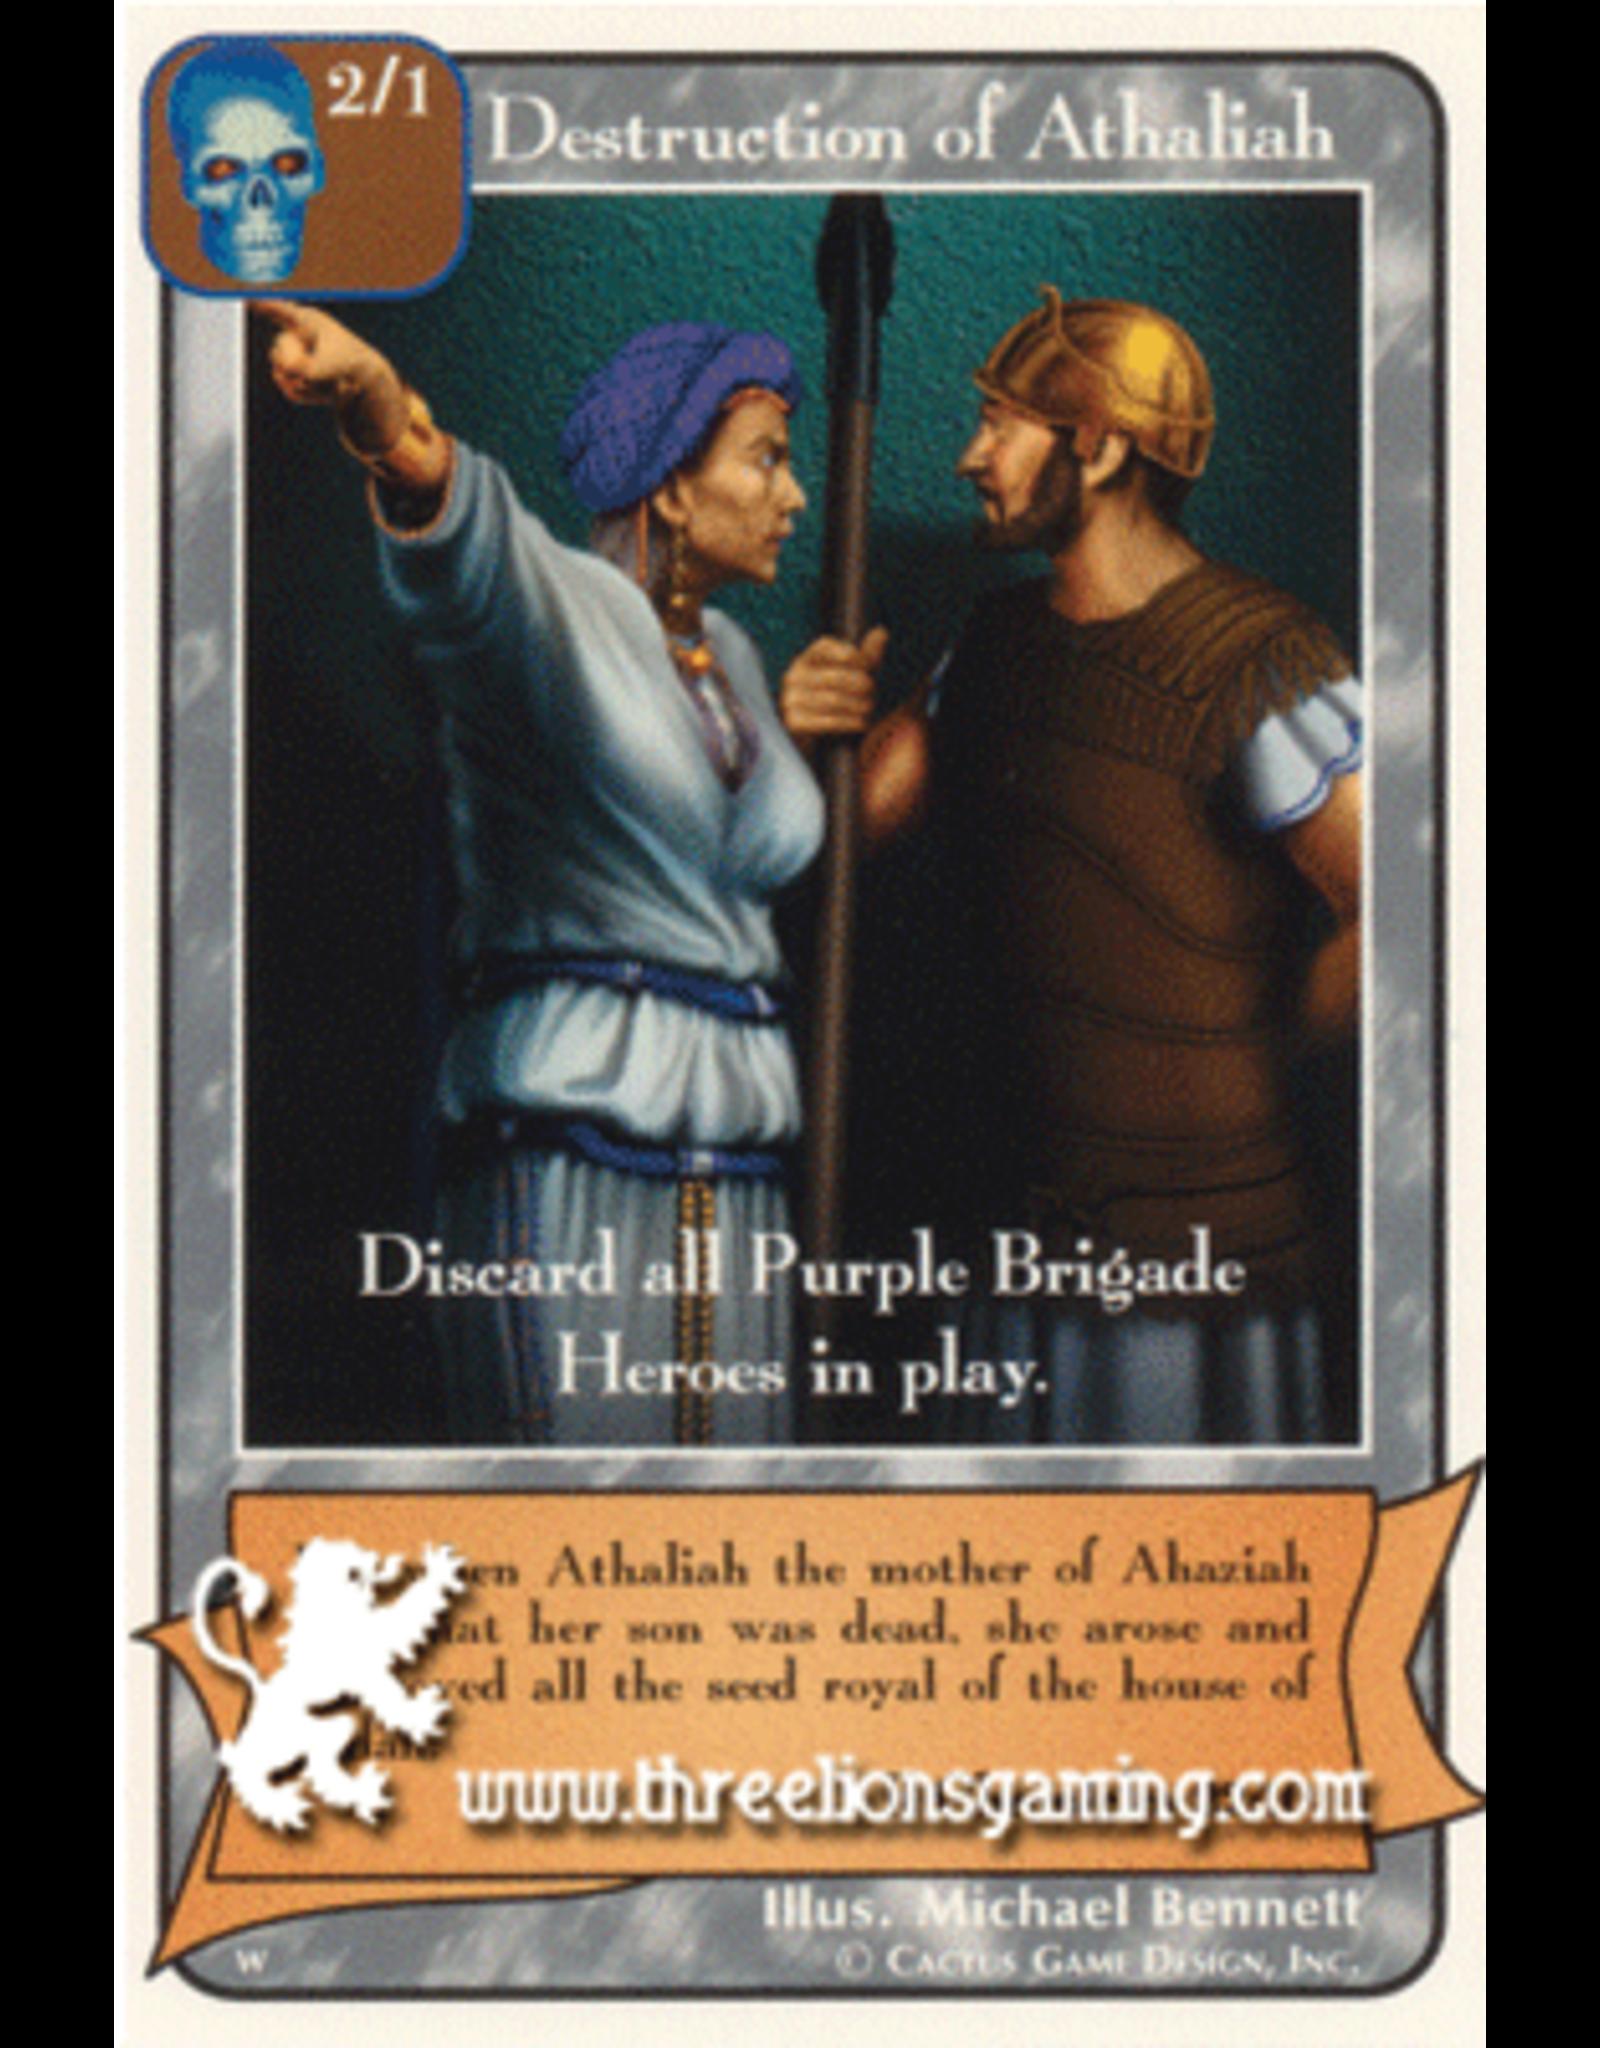 Destruction of Athaliah (WO)